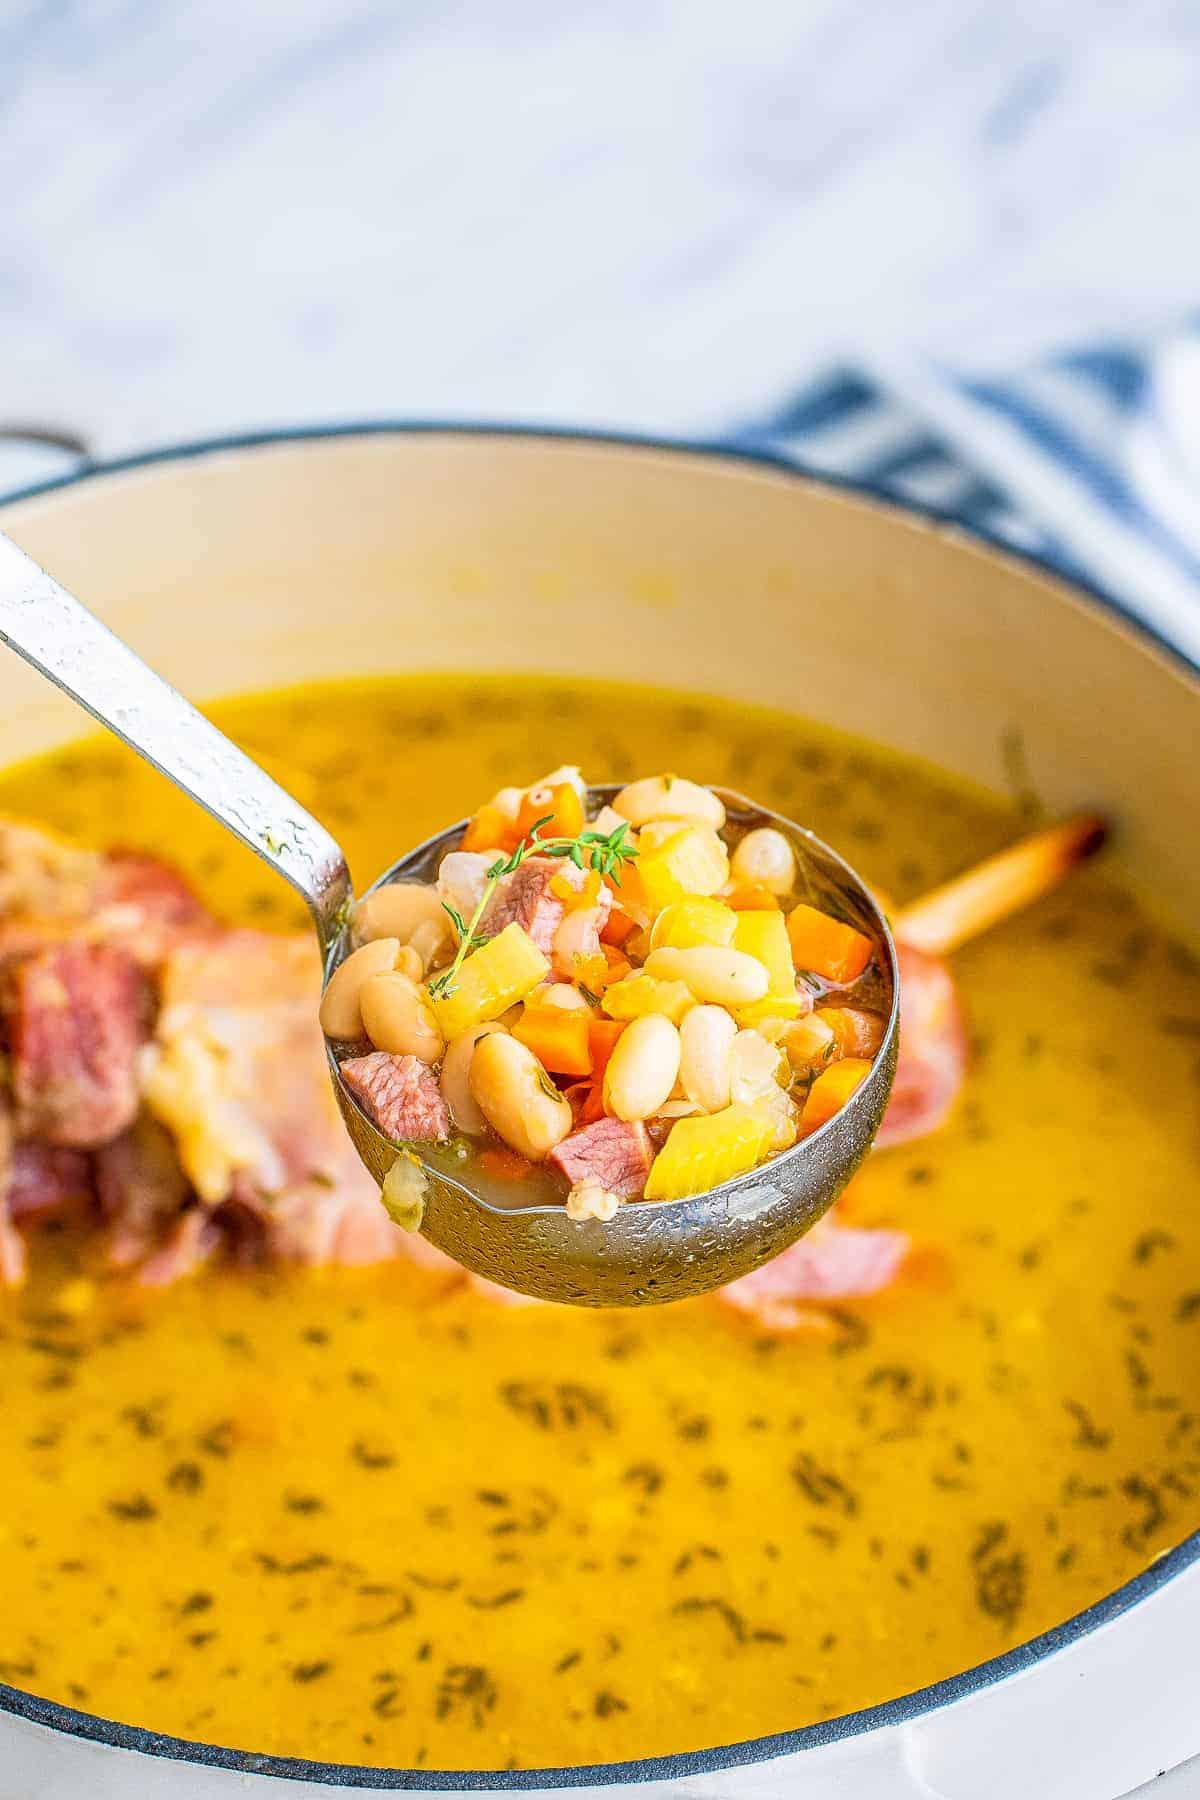 Ladle with ham bone soup in it